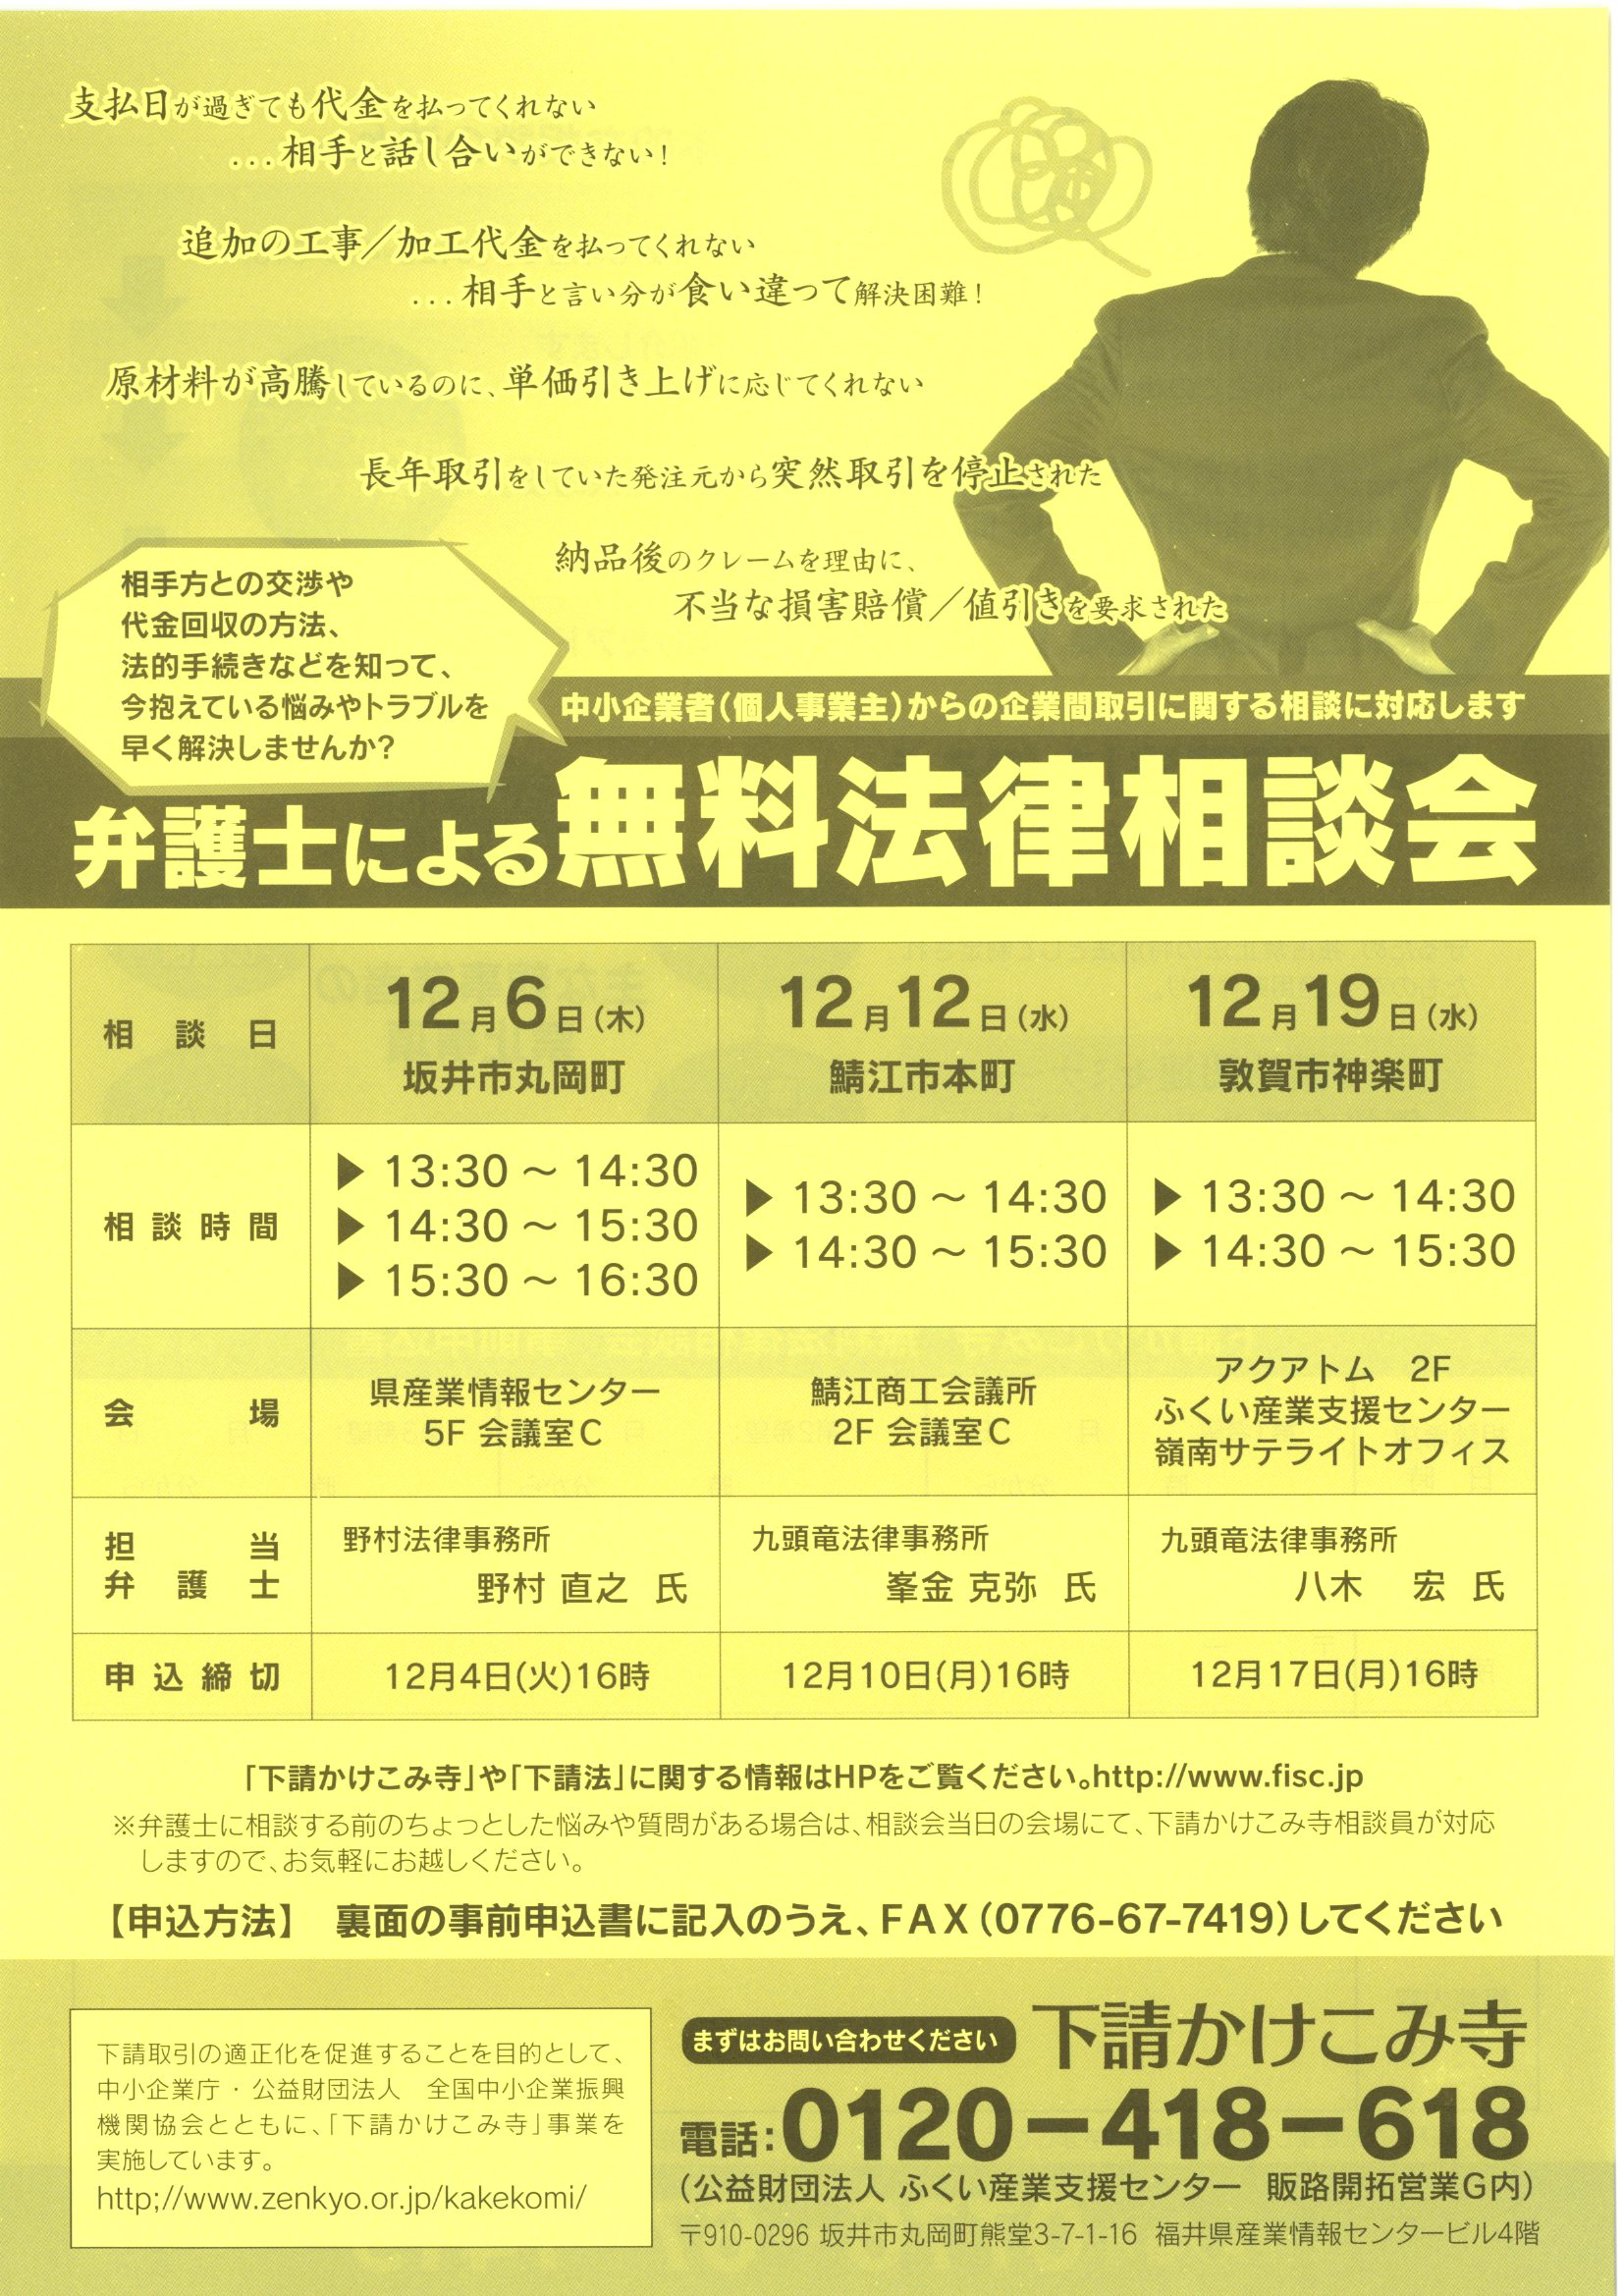 http://www.fisc.jp/business/wp-content/uploads/sites/6/2018/11/img20181127_tirashi2.jpg